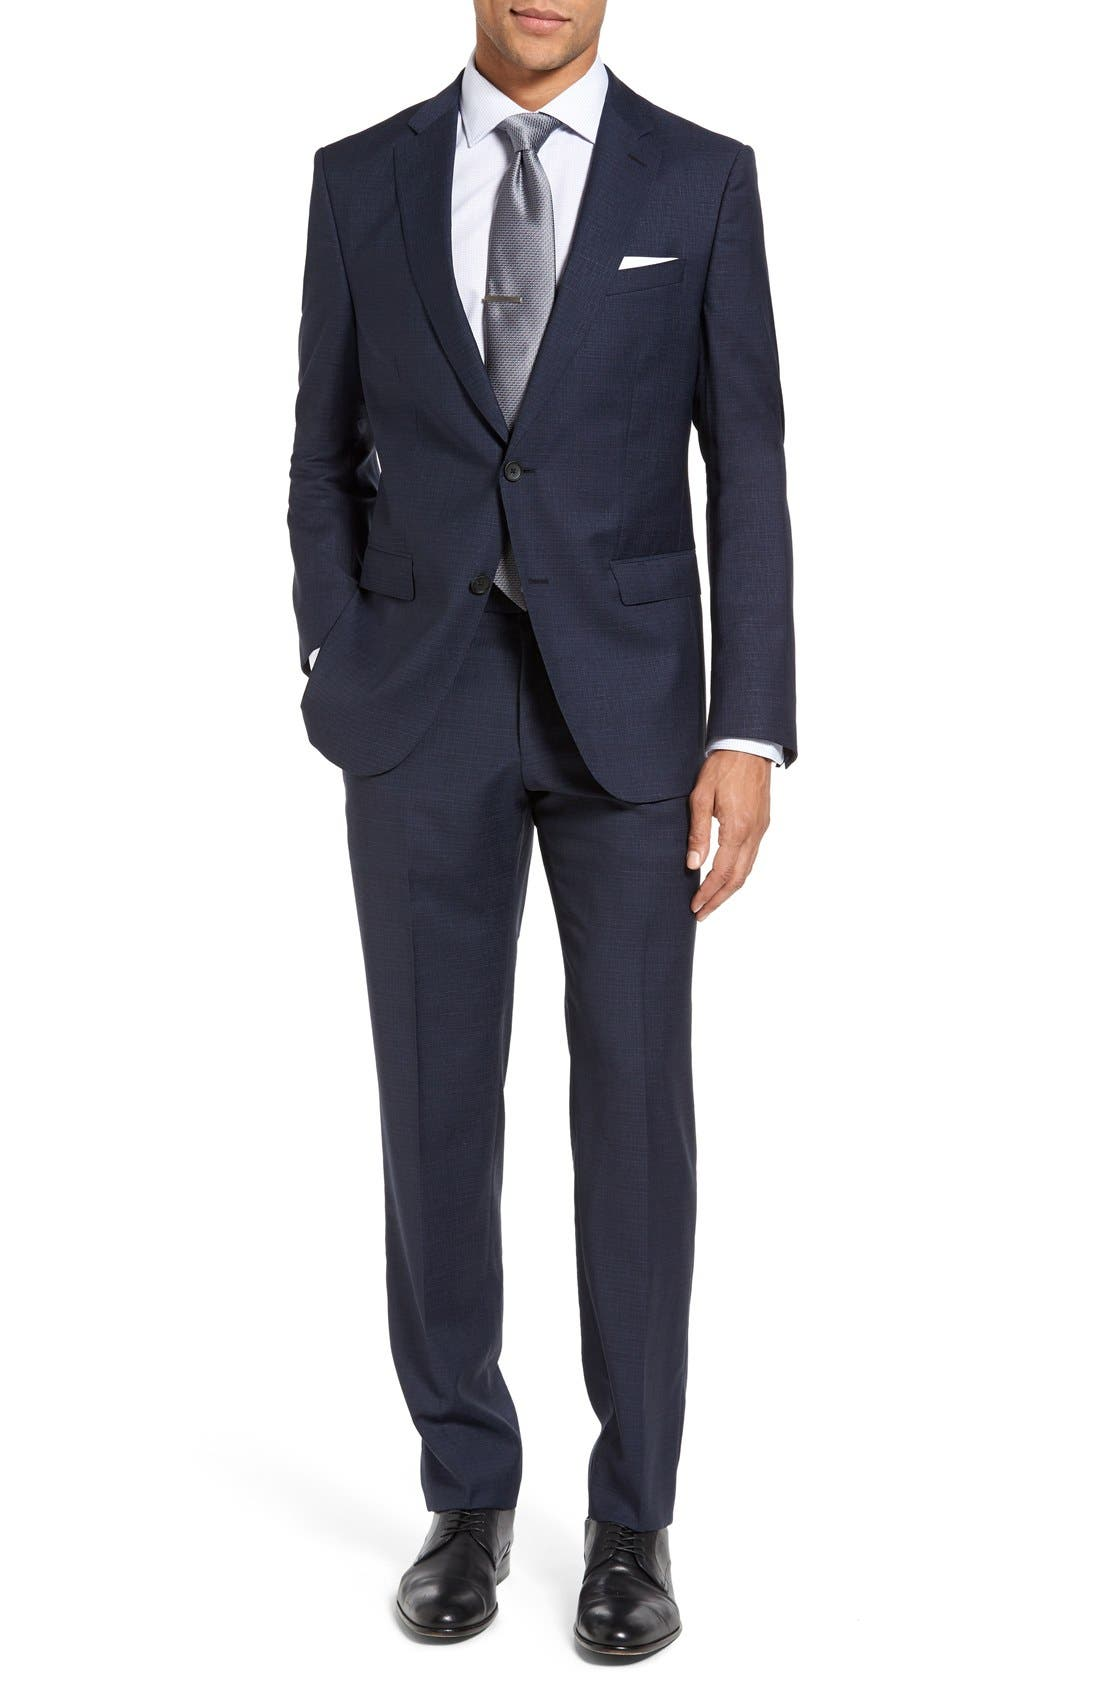 Alternate Image 1 Selected - BOSS Nova/Ben Trim Fit Solid Wool Suit